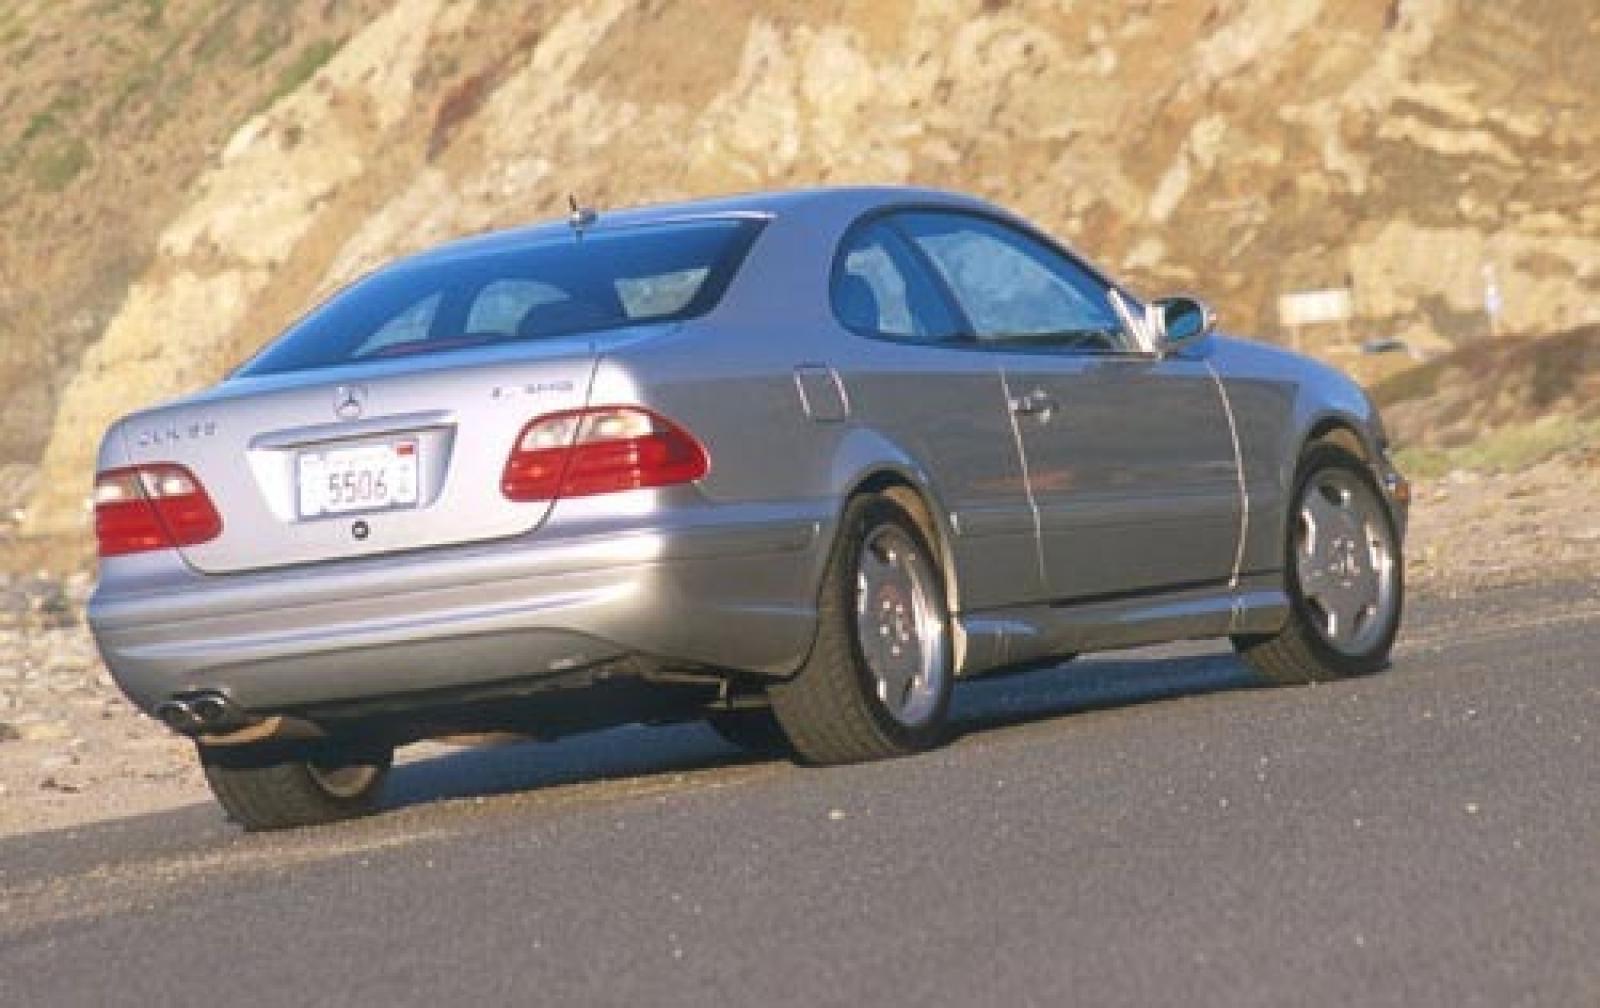 2002 mercedes benz clk class information and photos for Mercedes benz clk 2002